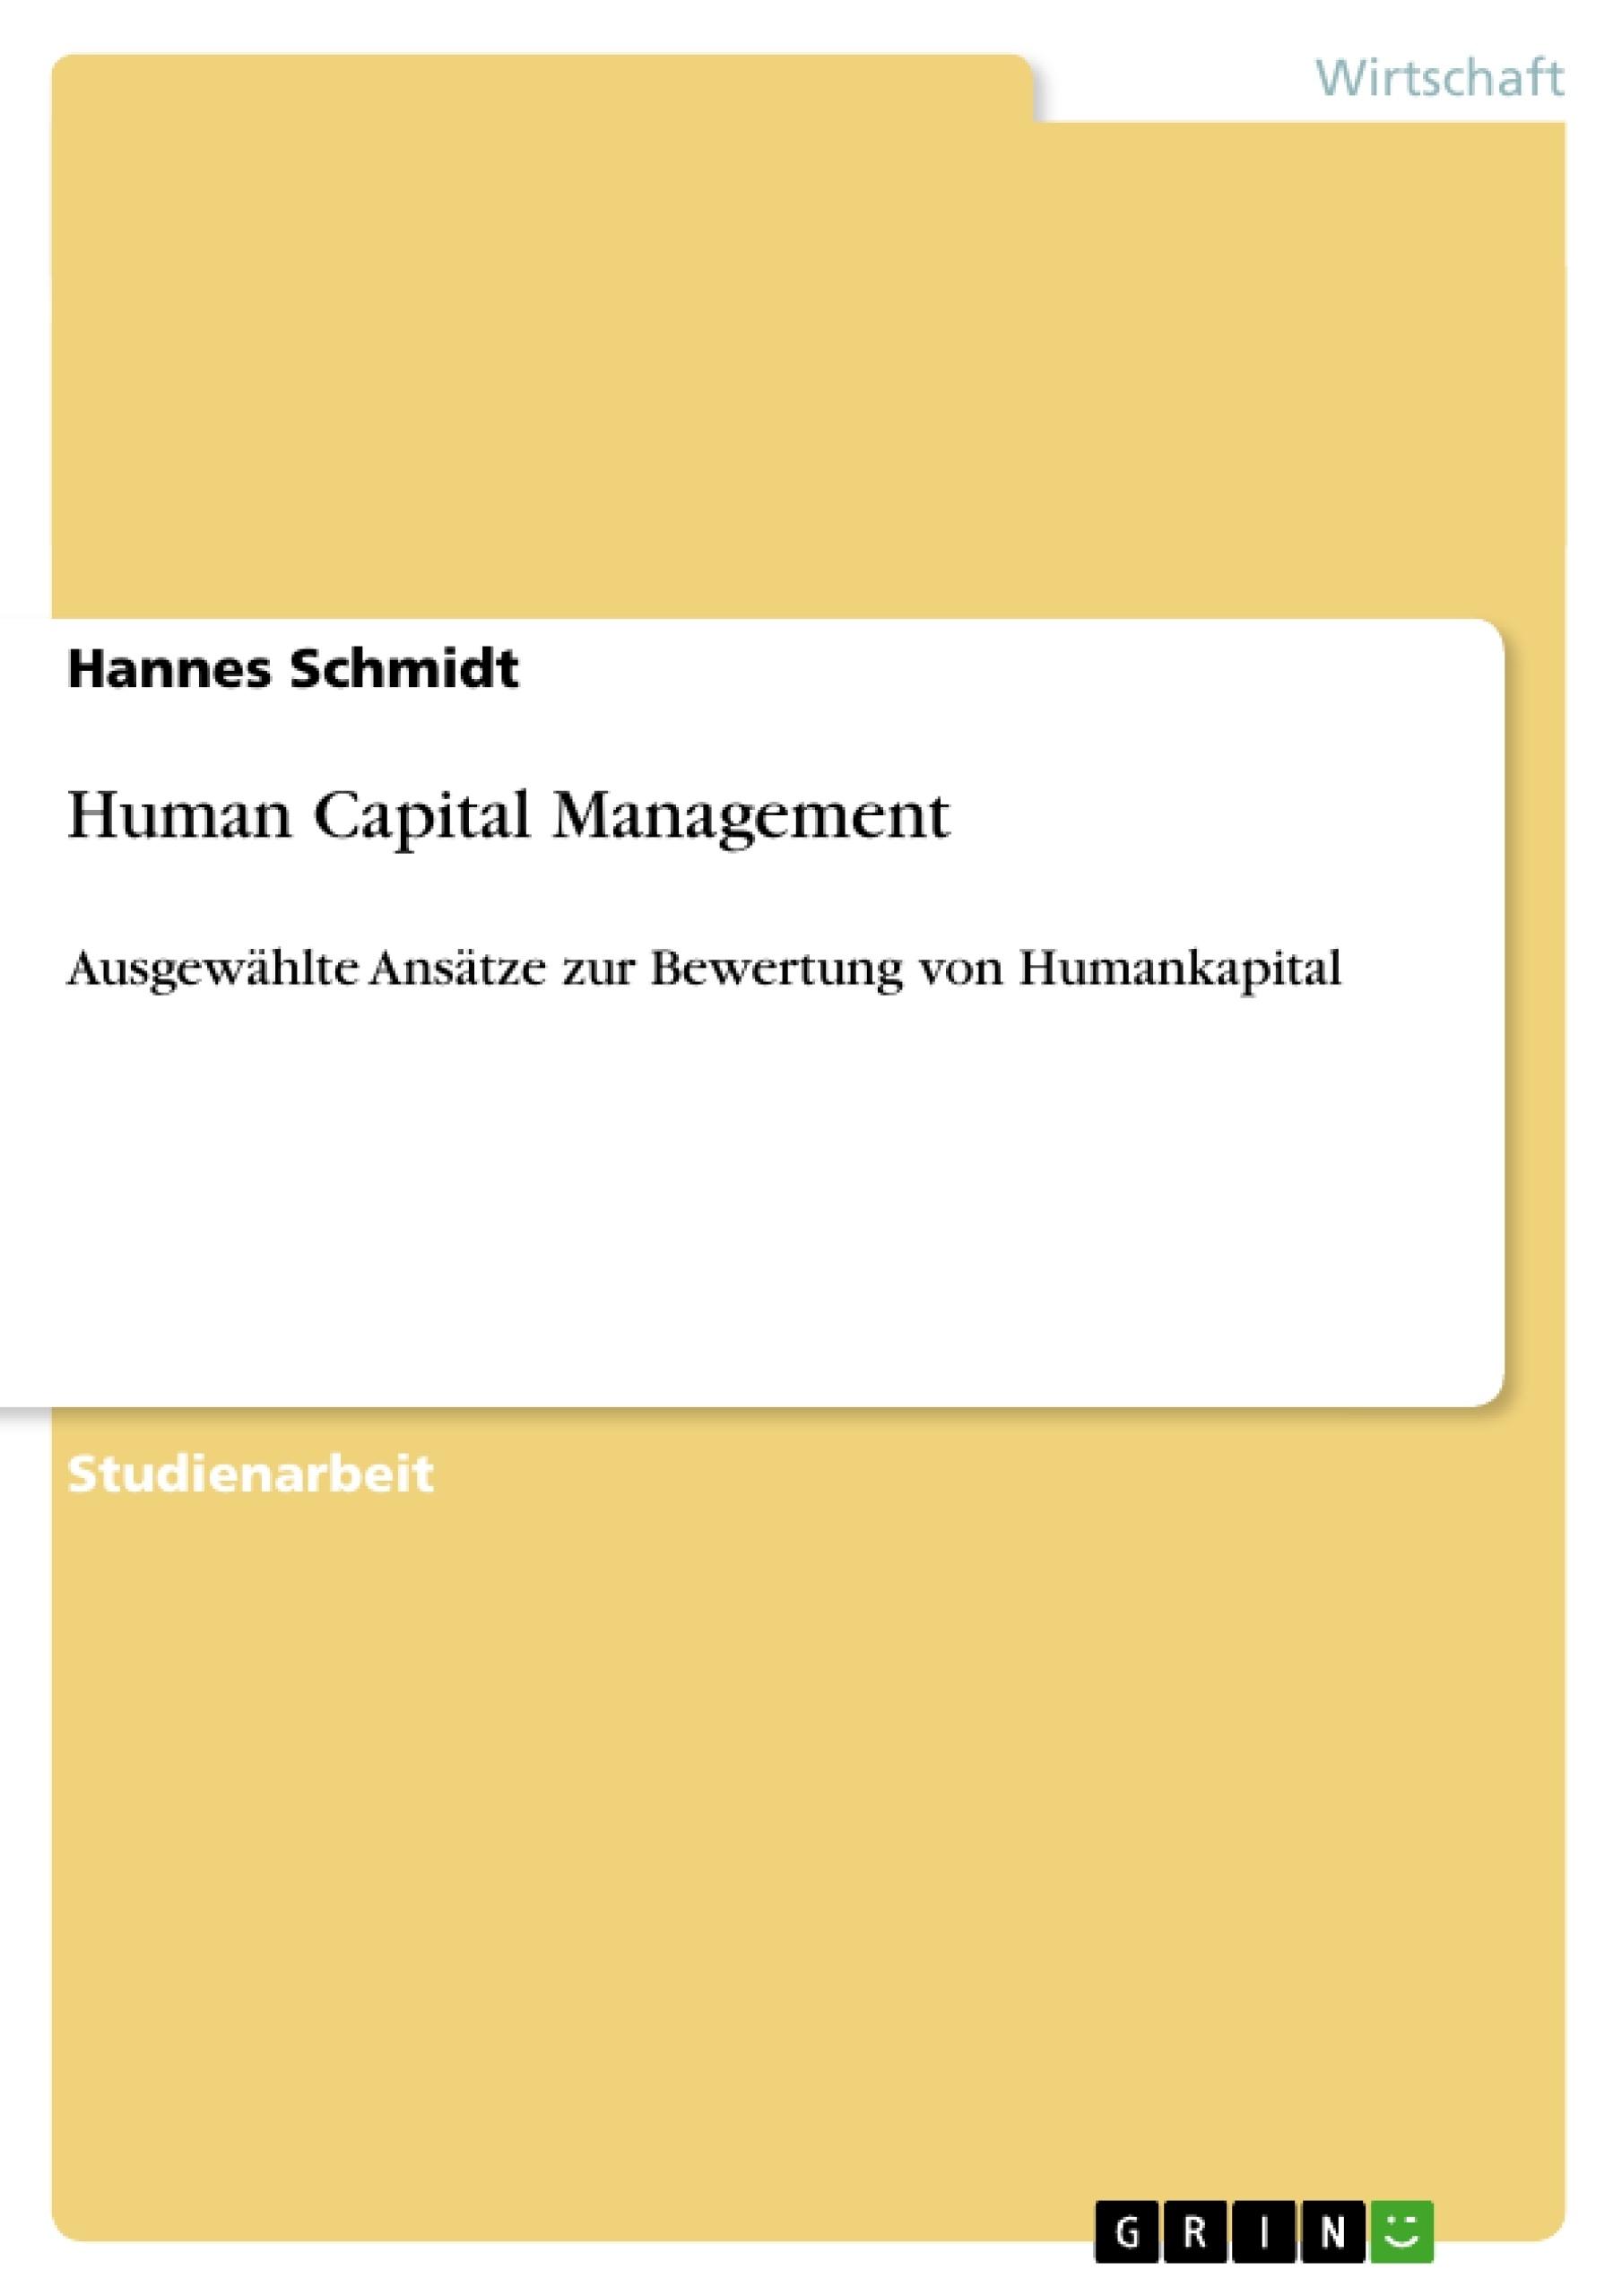 Titel: Human Capital Management